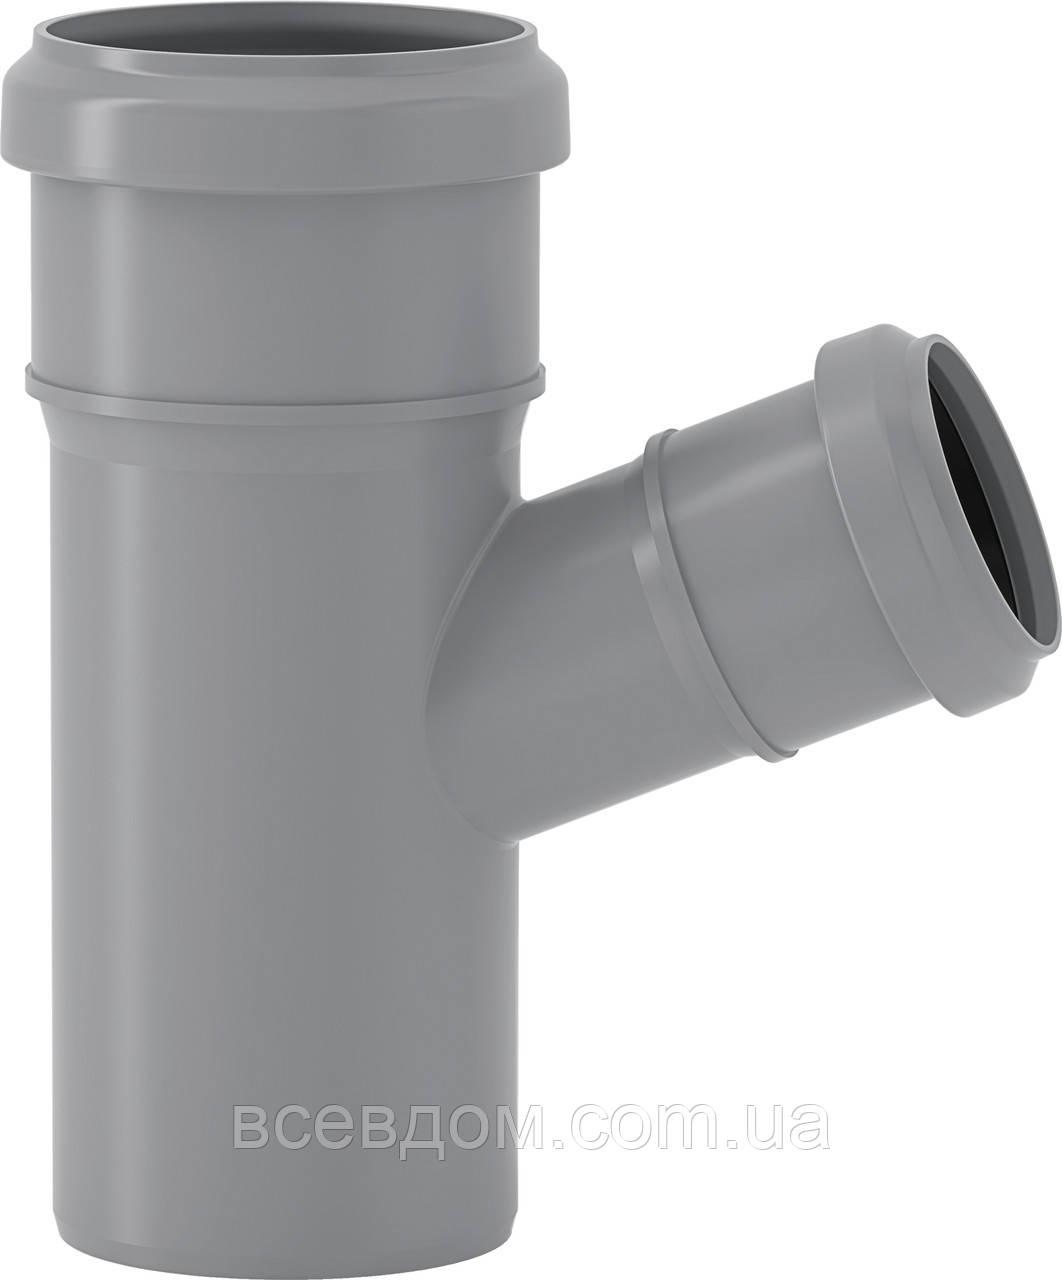 HTEA тройник Valsir внутренней канализации 110/50х67°